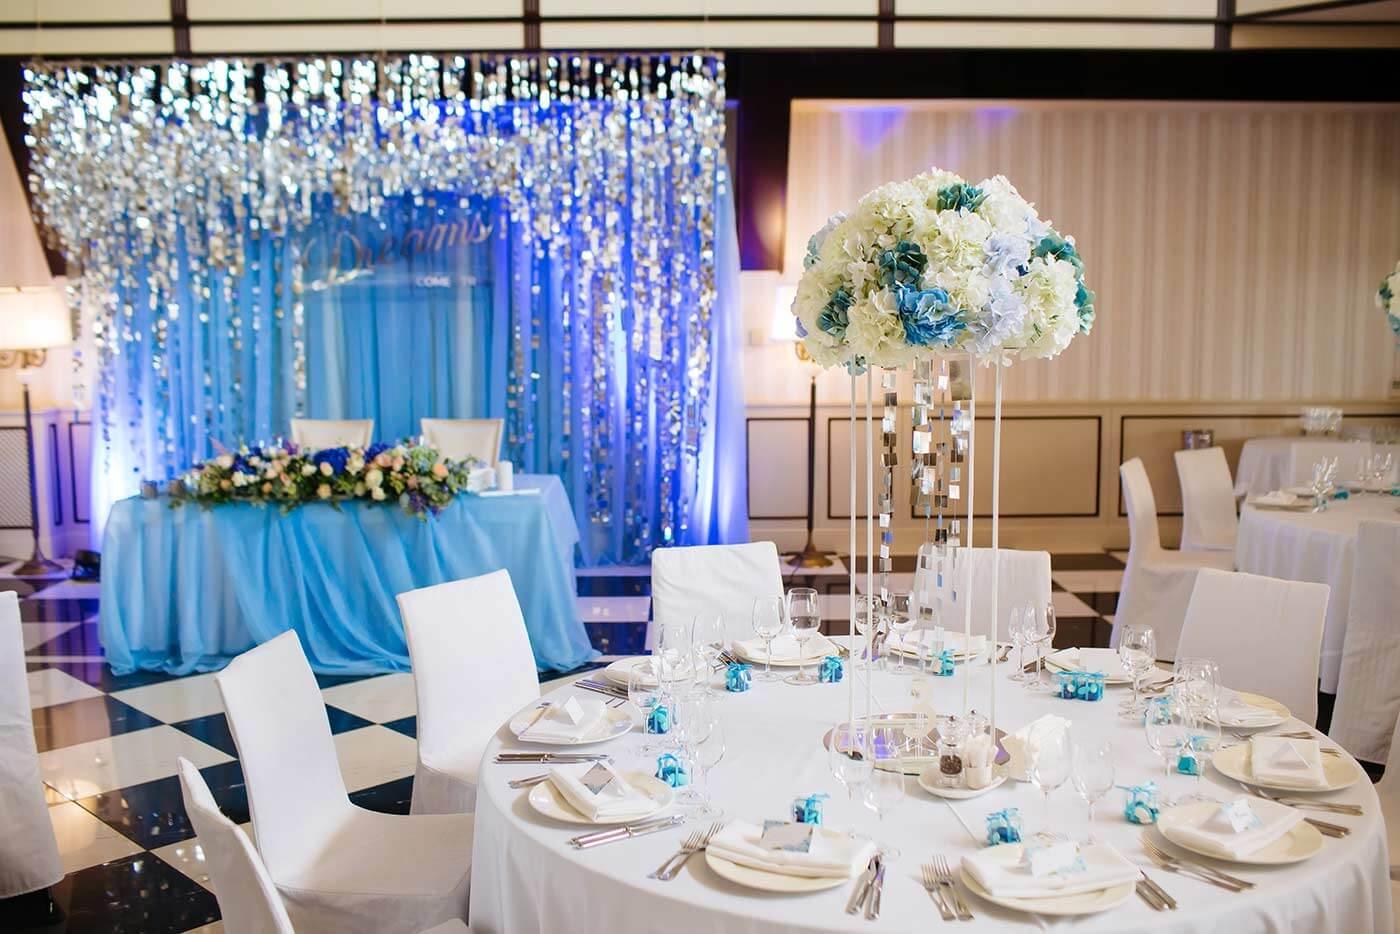 Hochzeitsdeko Blau